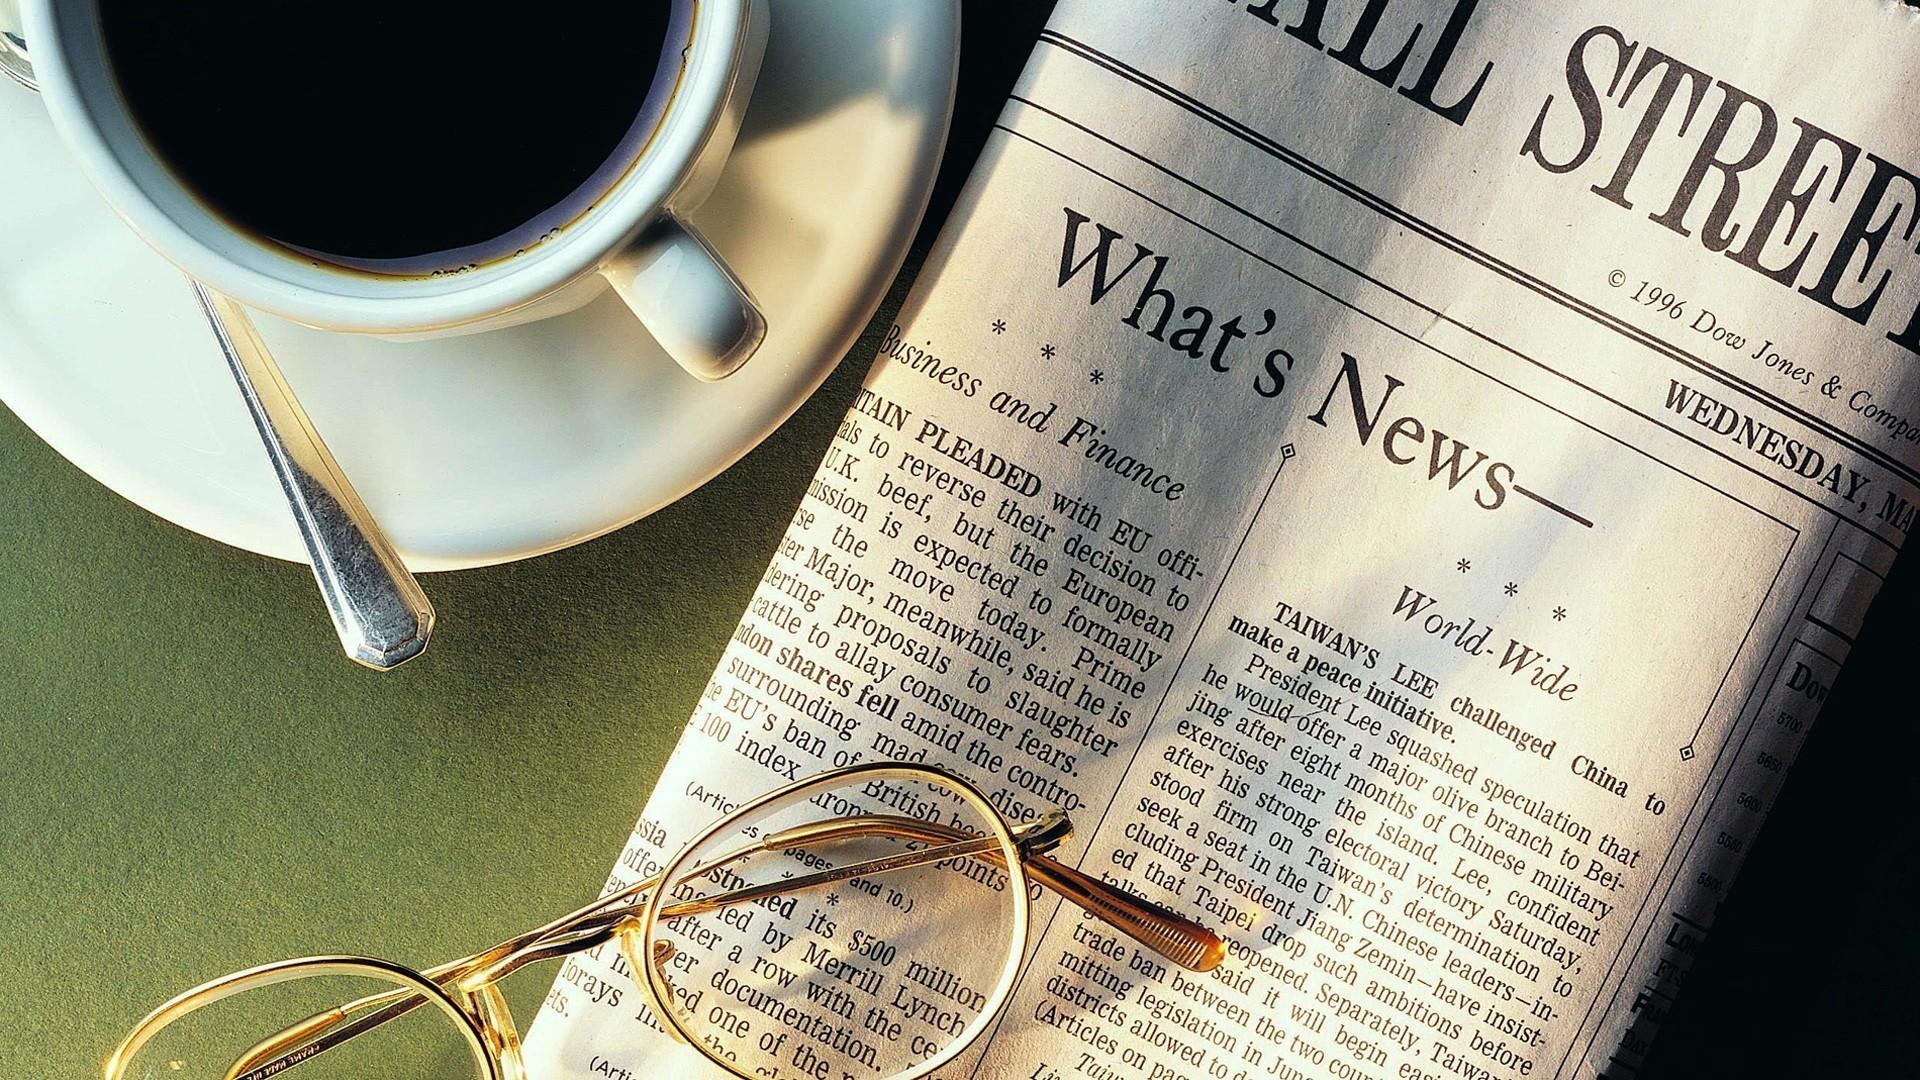 The Wall Street Journal quer alcançar marca de 3 milhões de assinanturas